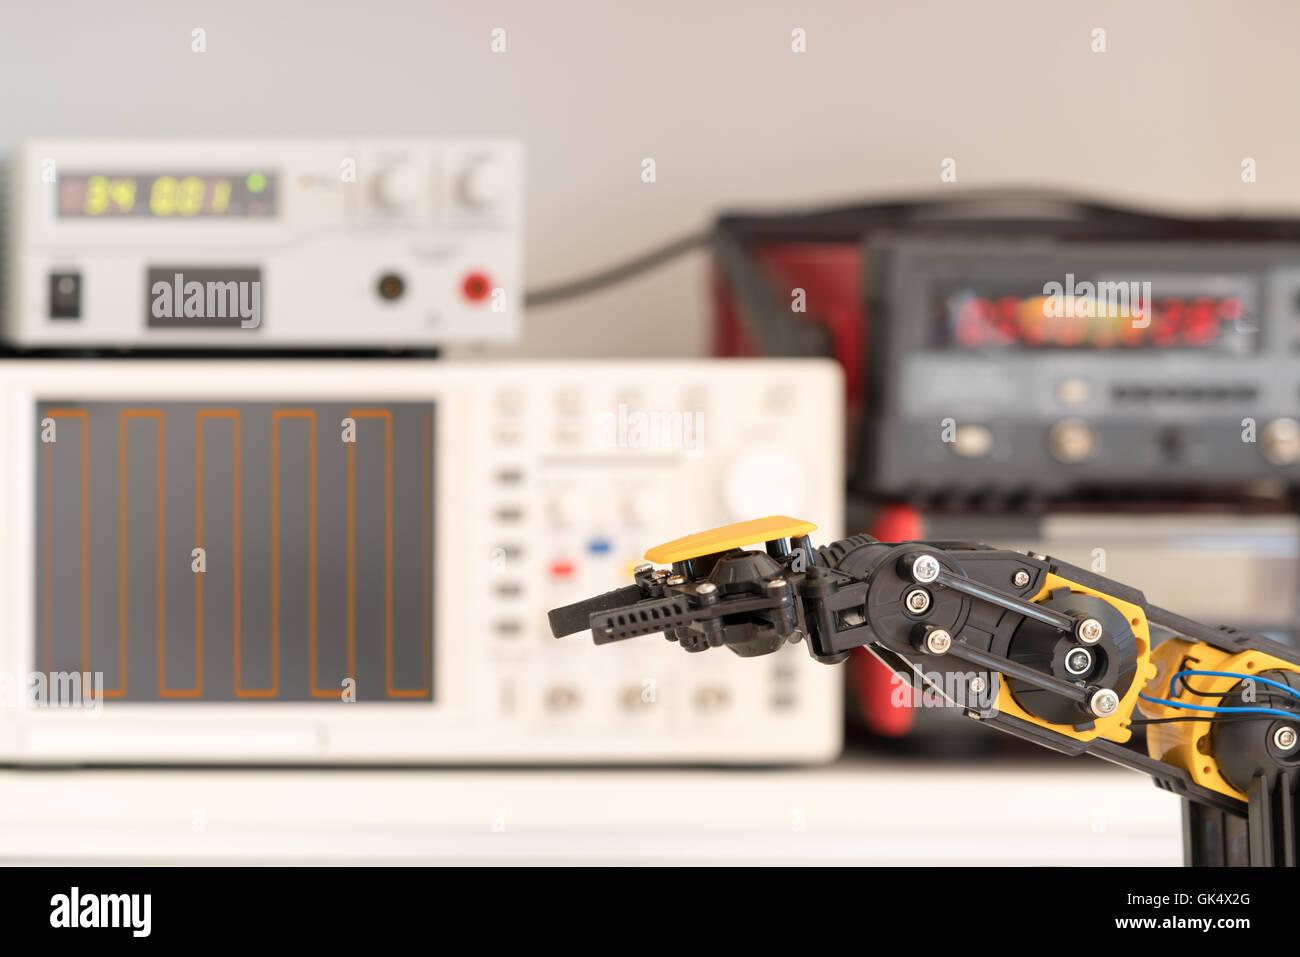 Plastic model of industrial robotics arm Robot manipulator - Stock Image